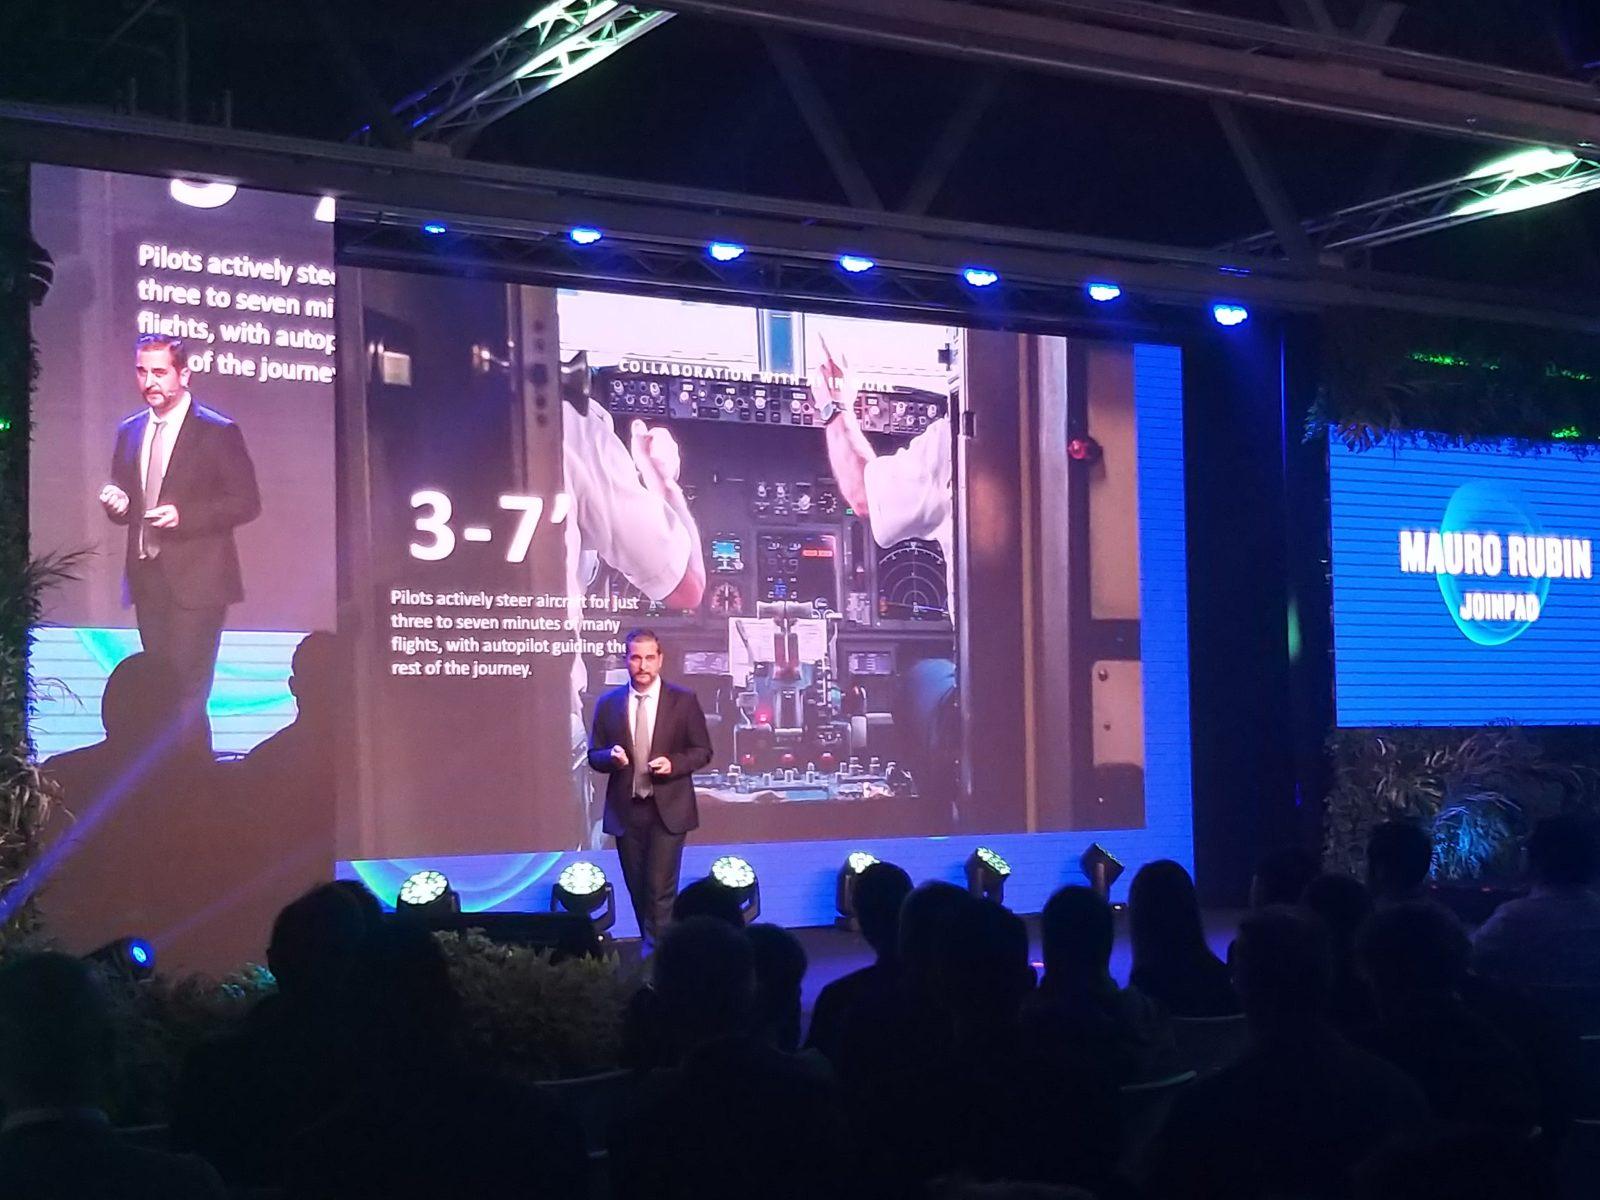 Mauro Rubin CEO of JoinPad at Futureland 2018 on stage